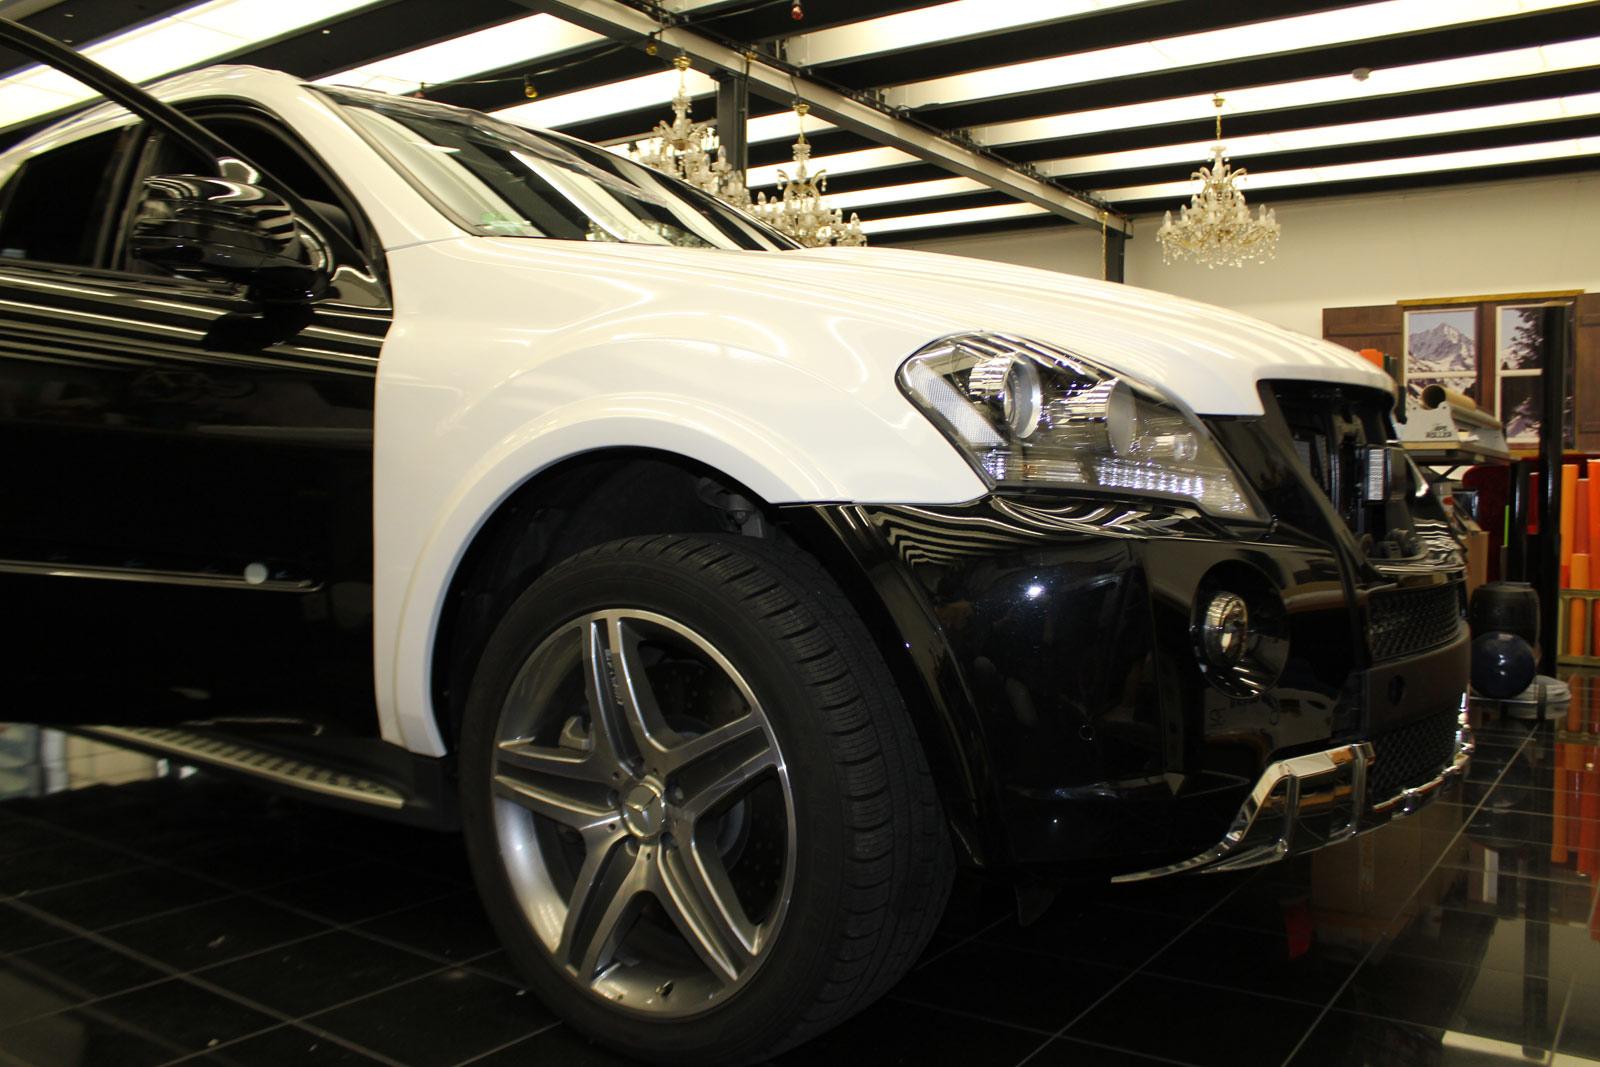 Mercedes_ML_63_AMG_Folierung_Weiss_Glanz_06